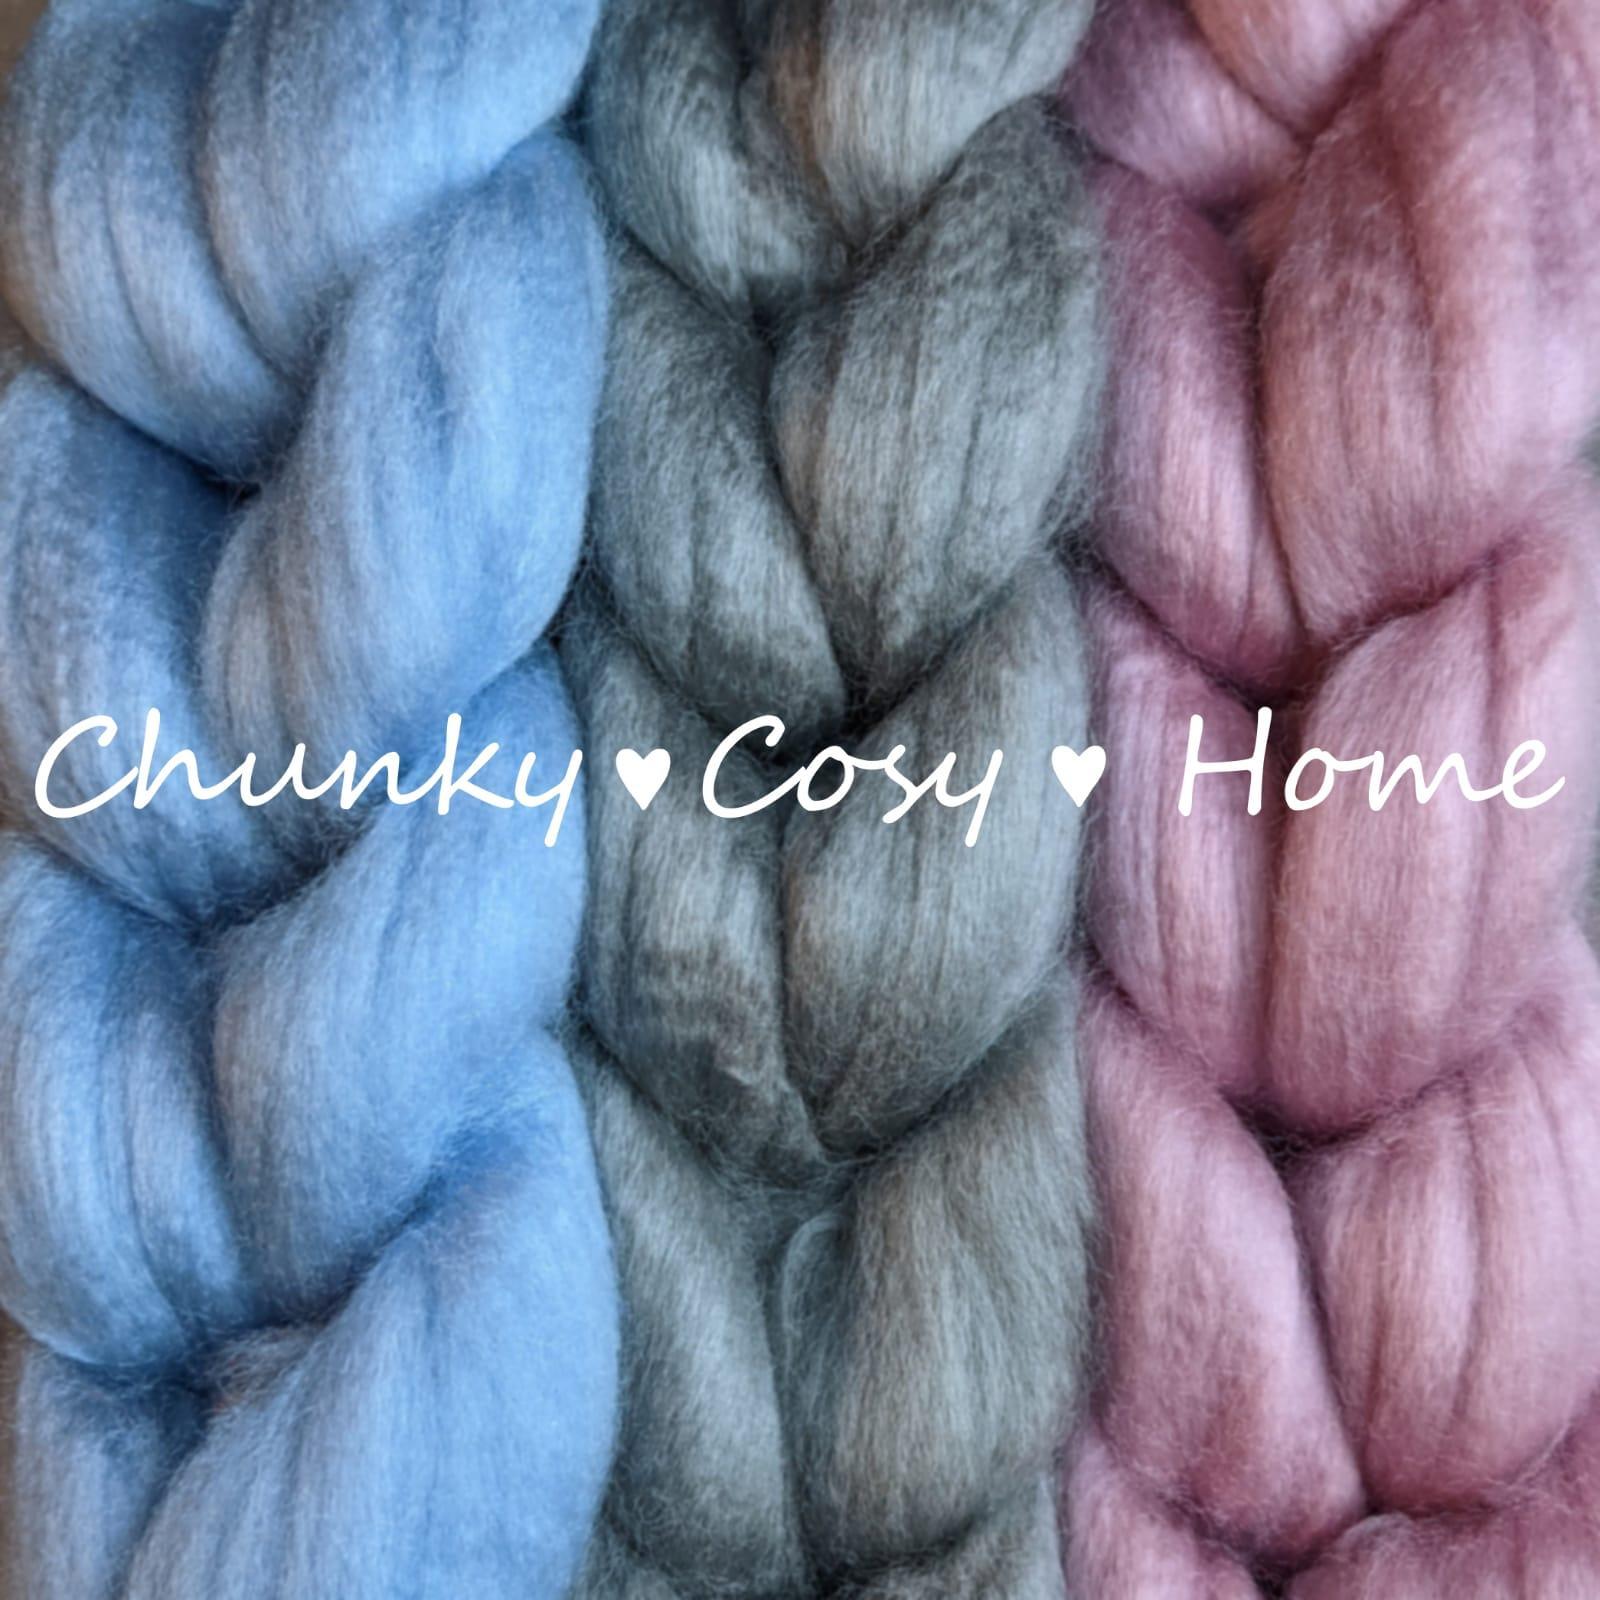 Chunky Cosy Home